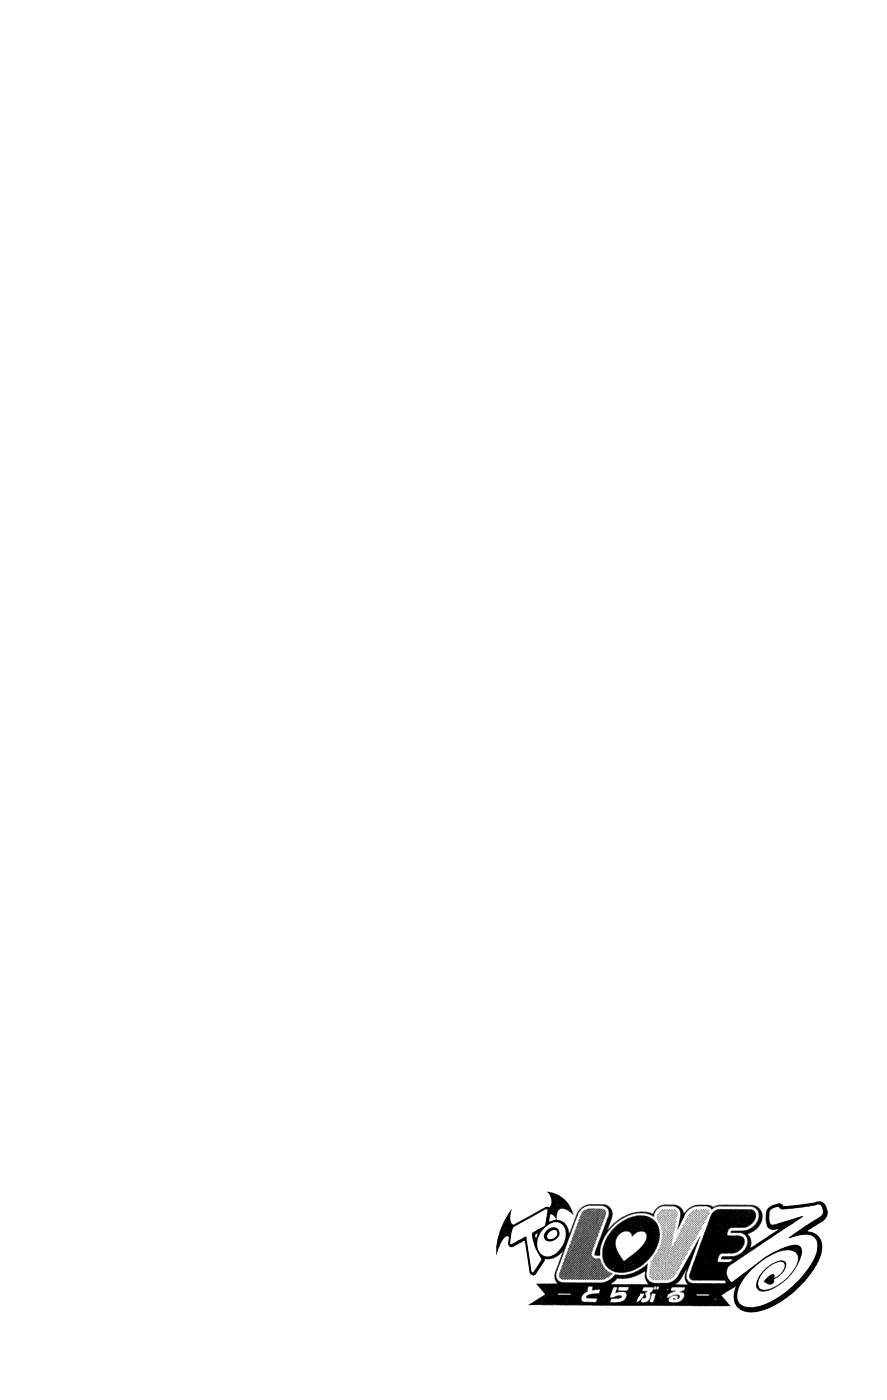 Манга Любовные неприятности / To Love-Ru  - Том 7 Глава 60 Страница 20